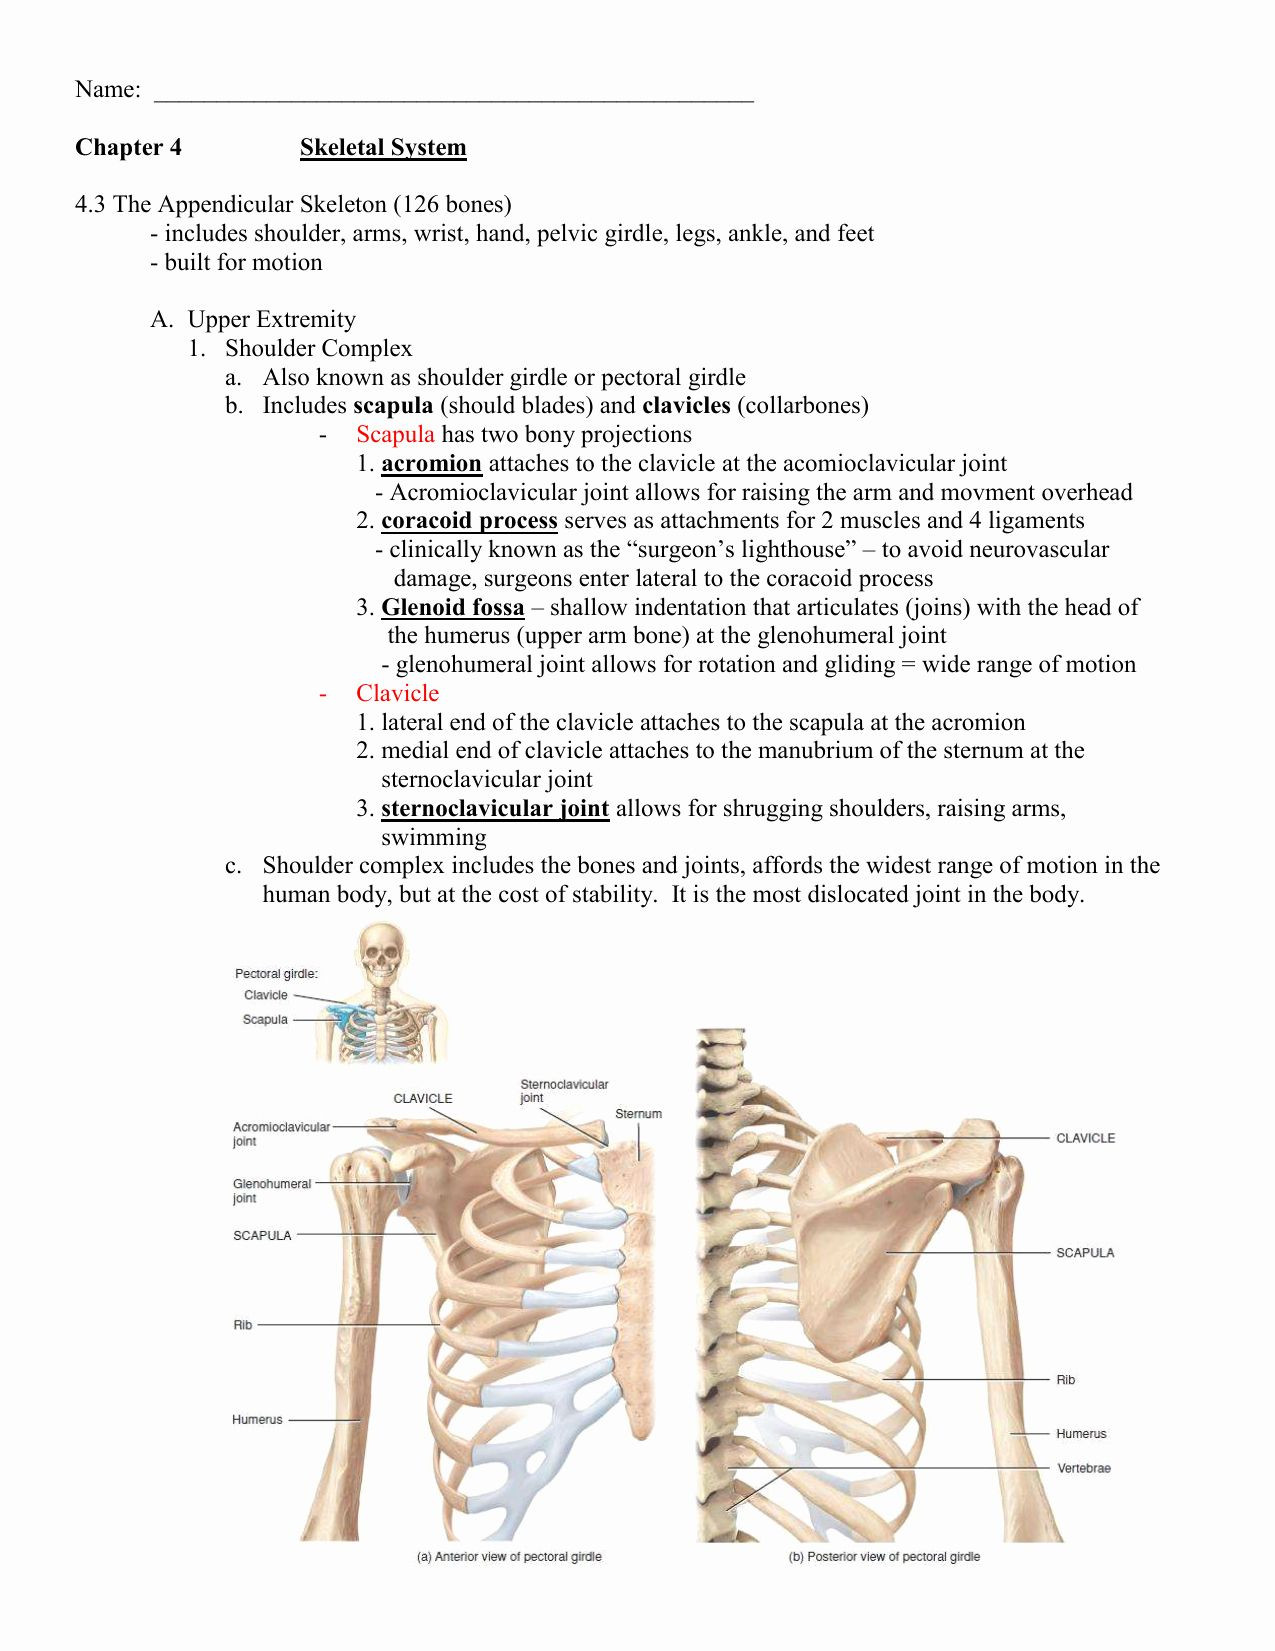 Appendicular Skeleton Worksheet Answers Appendicular Skeleton Worksheet Answers Unique Worksheet